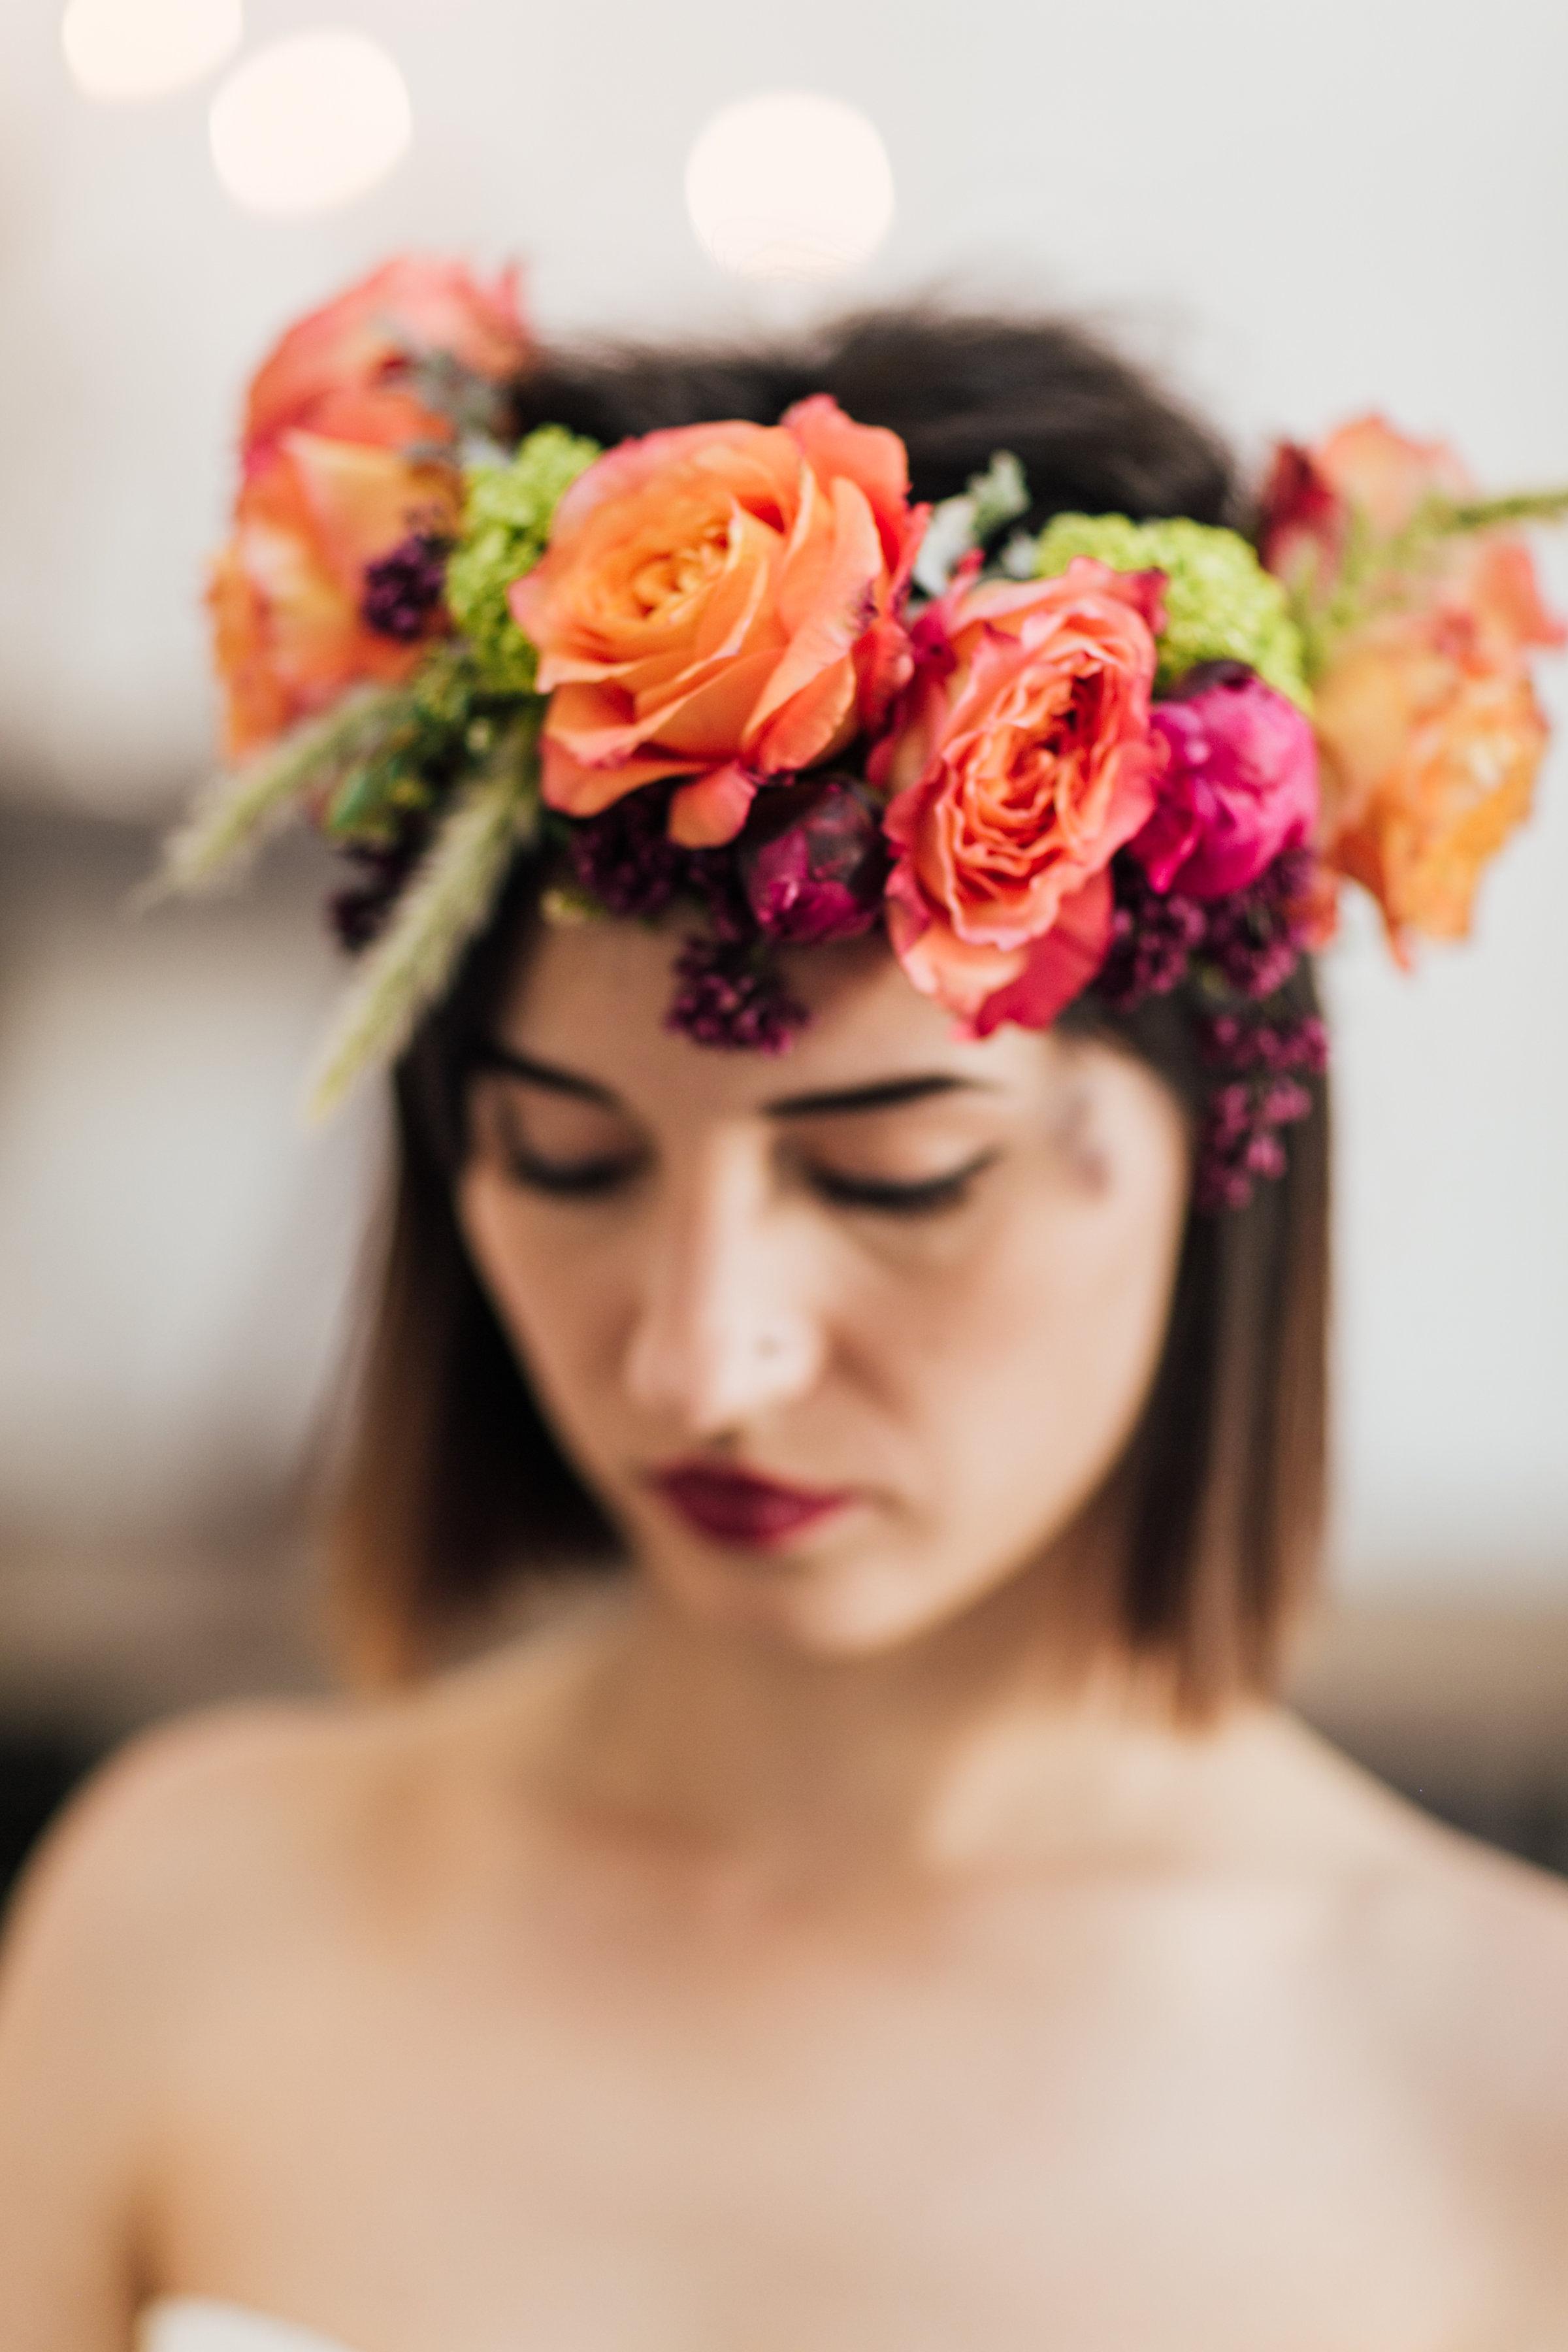 107_NYC-wedding-photographer-Amber-Marlow.jpg